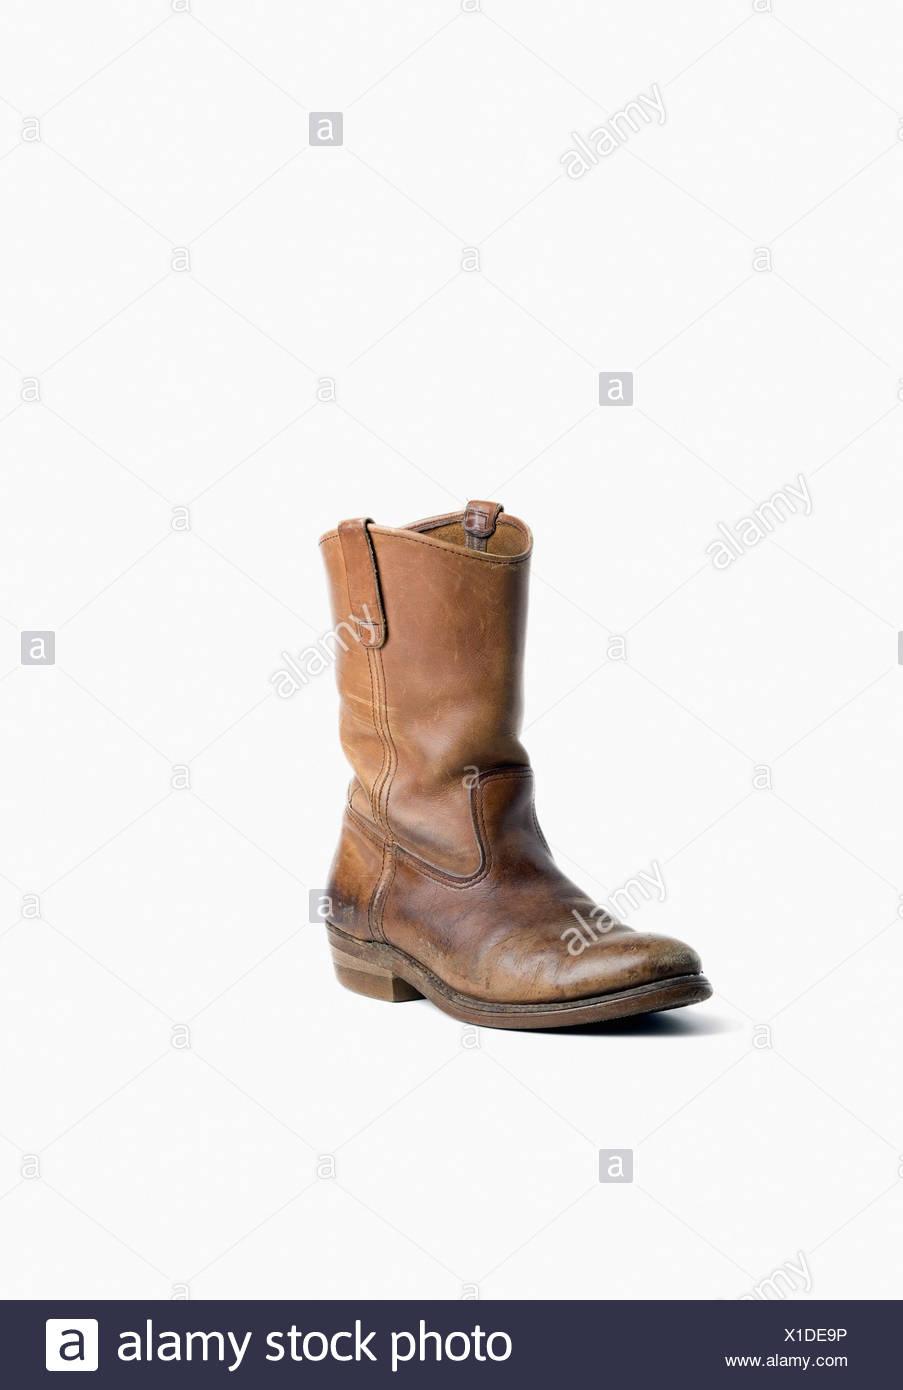 8f2a76af9d5 Cowboy Boot Stock Photos & Cowboy Boot Stock Images - Alamy